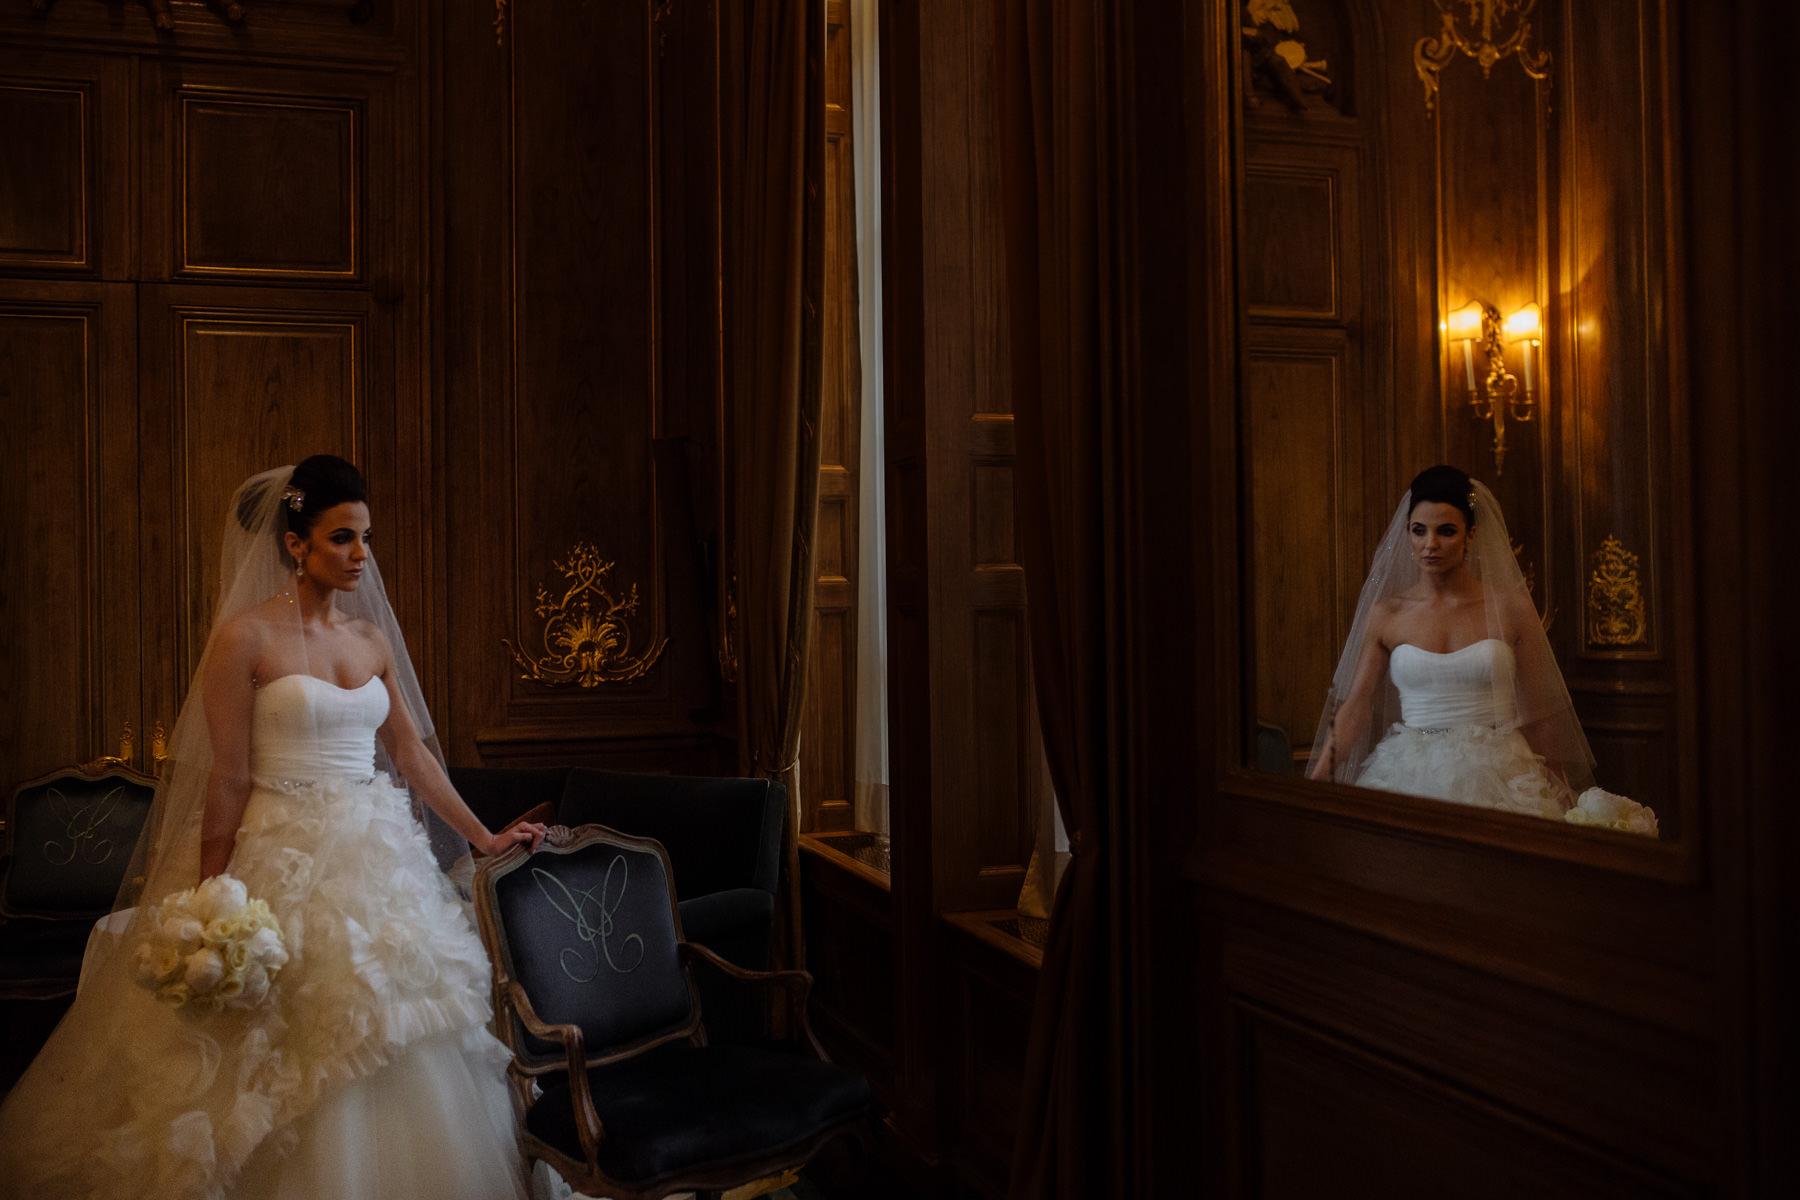 013Claridges Wedding Photography London.jpg